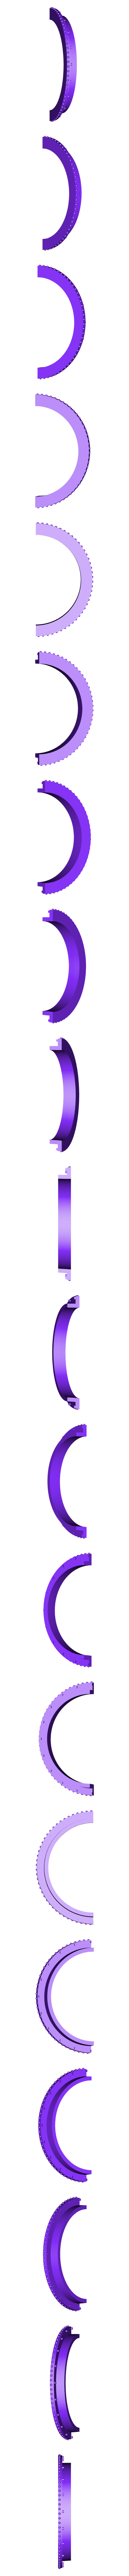 Boiler_Section_1_-_SCALED_Part_1-.STL Download free STL file 4-8-8-4 Big Boy Locomotive • 3D printer object, RaymondDeLuca